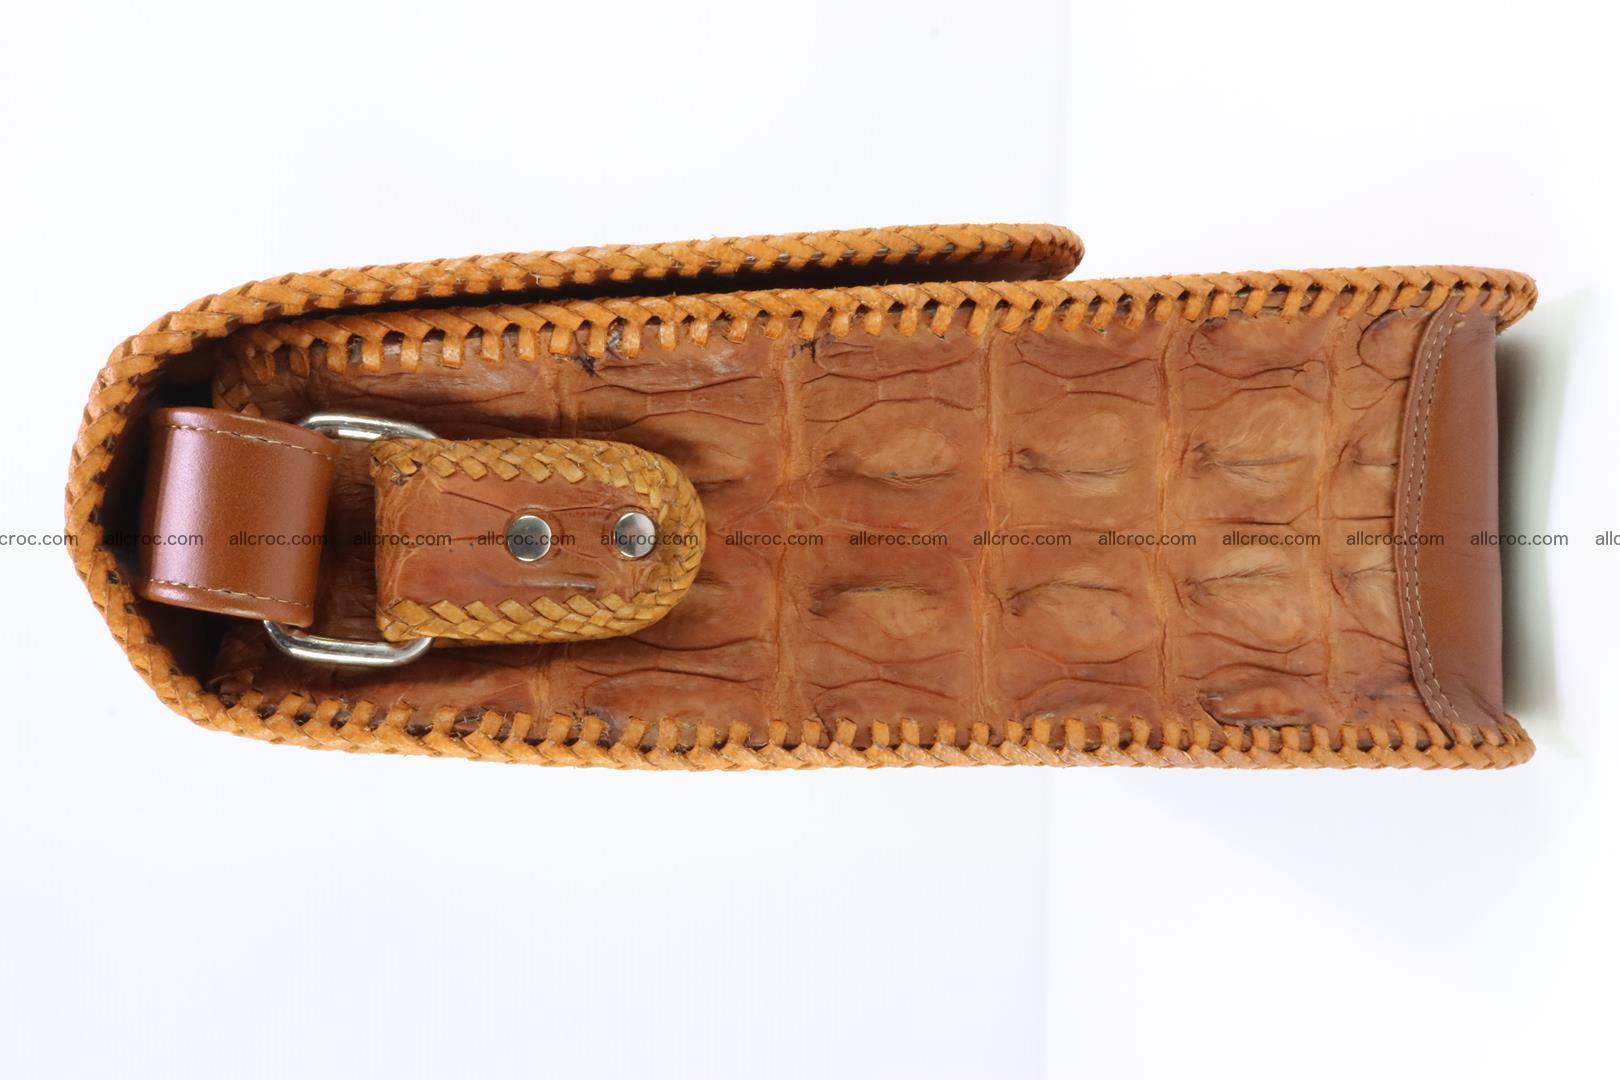 Сrocodile skin shoulder bag with braided edges 141 Foto 4